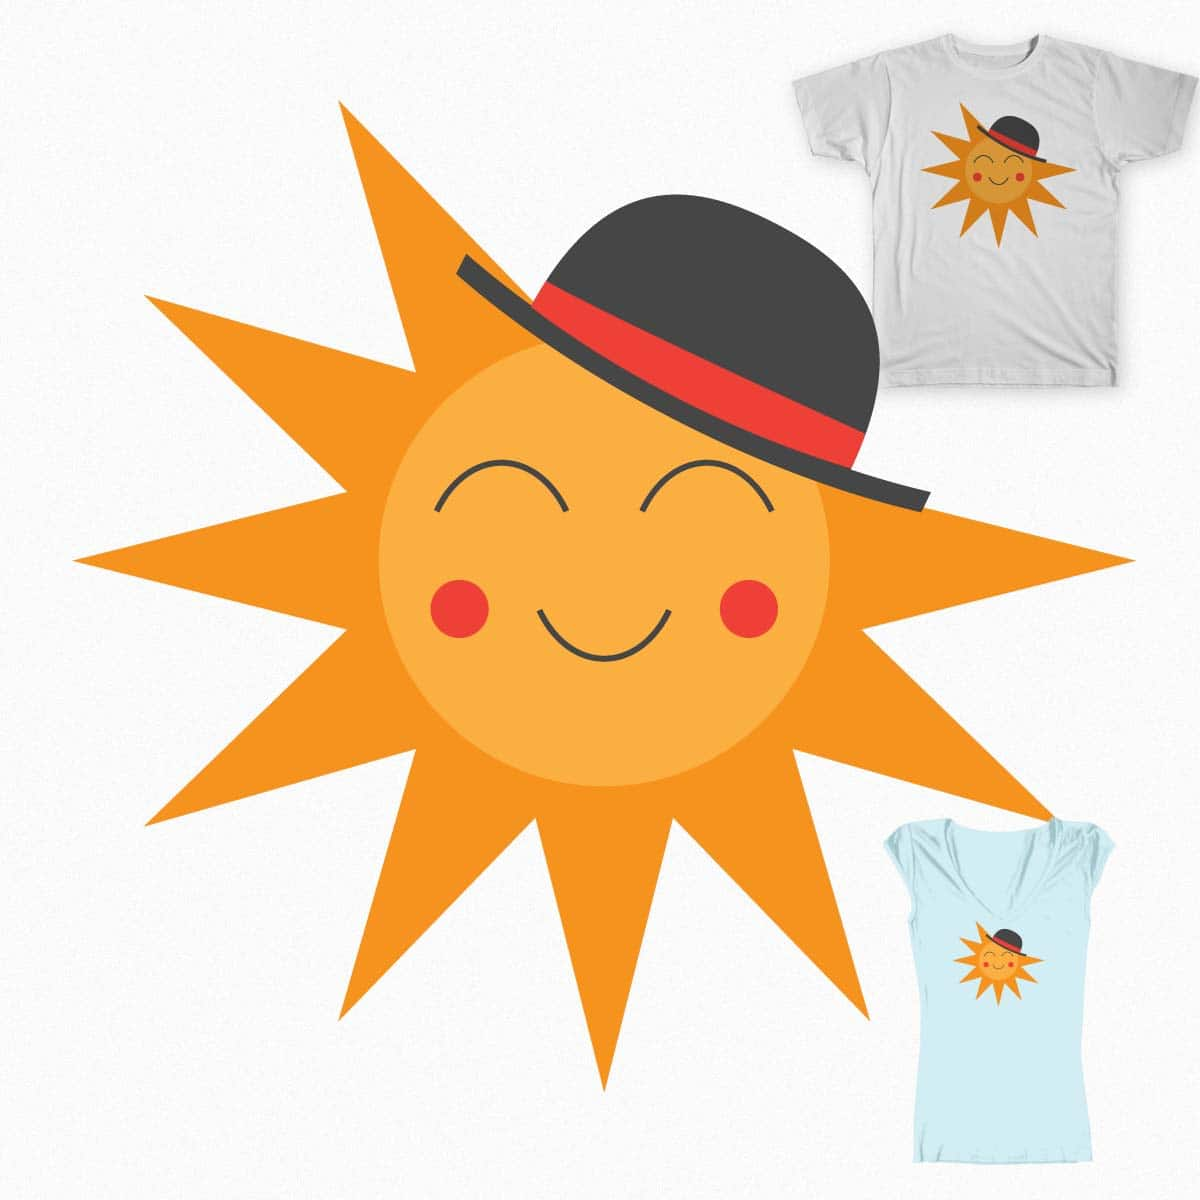 The Sun Has Got It's Hat On by danjit on Threadless